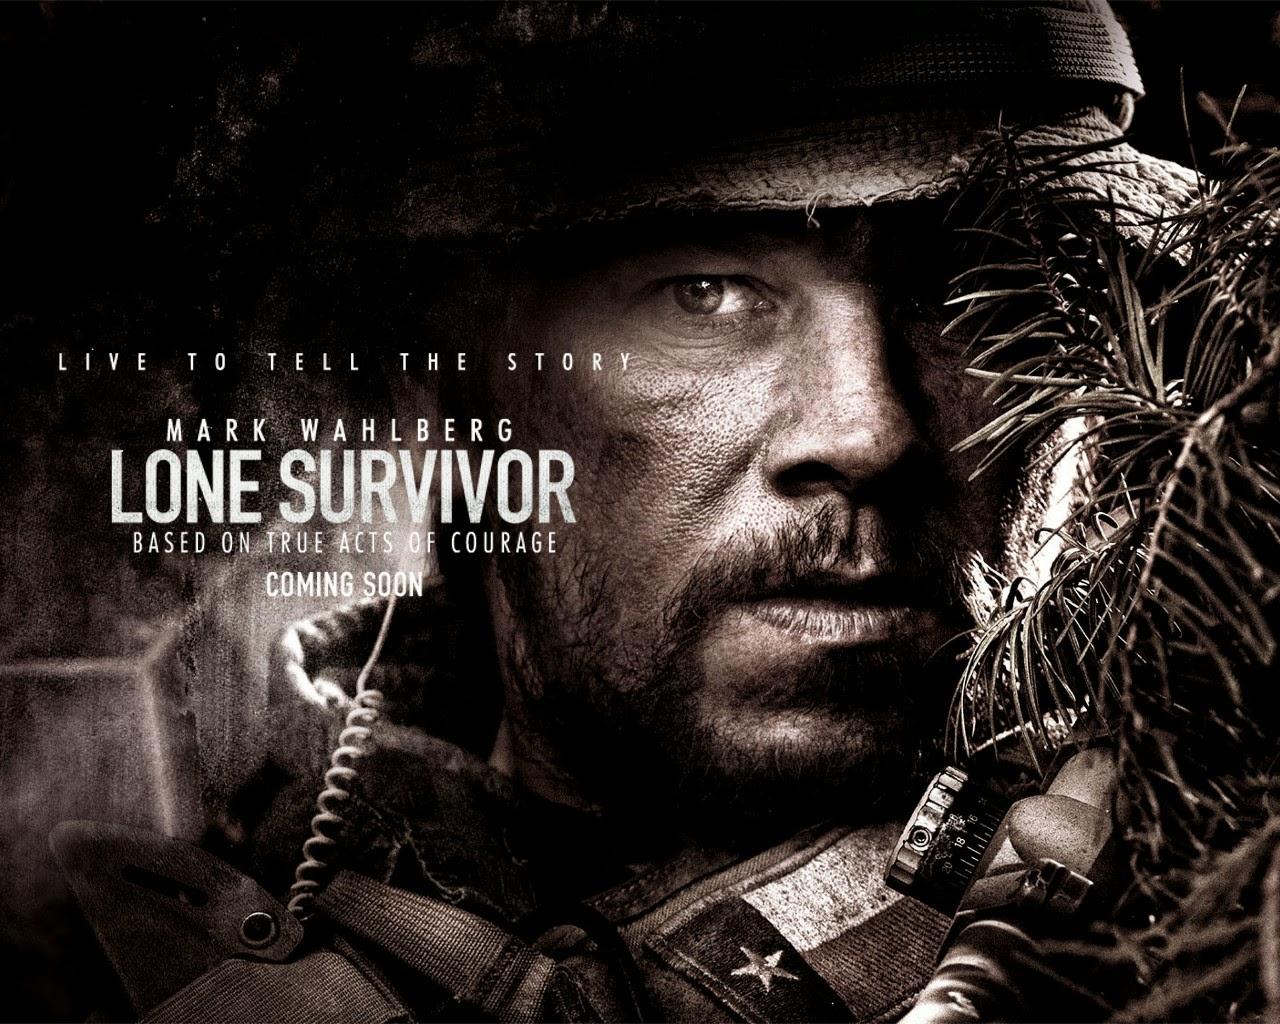 MyMovies: The Lone Survivor (2014)